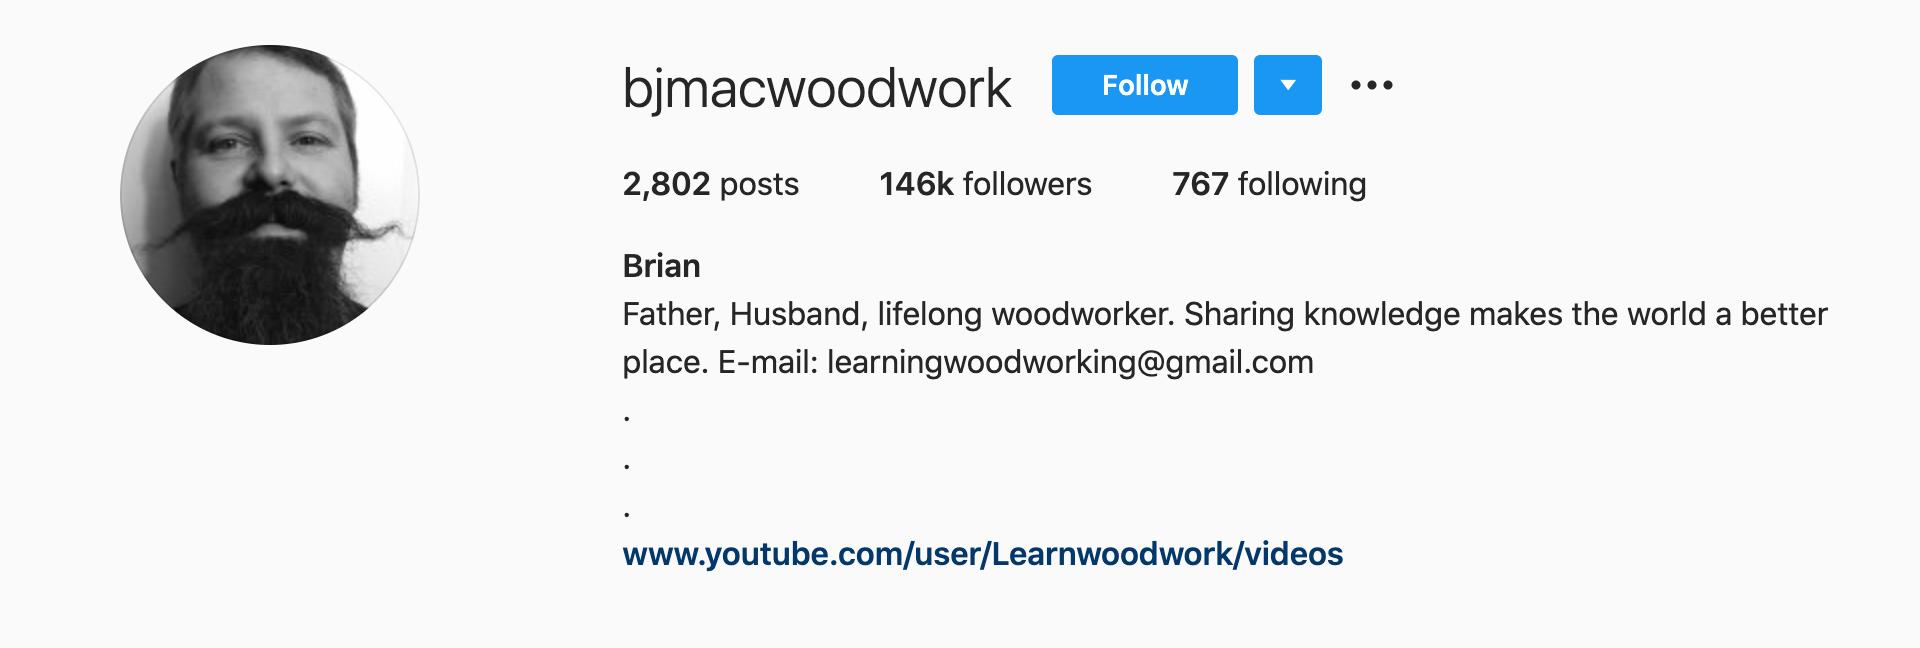 bj-mac-woodwork-instagram-profile